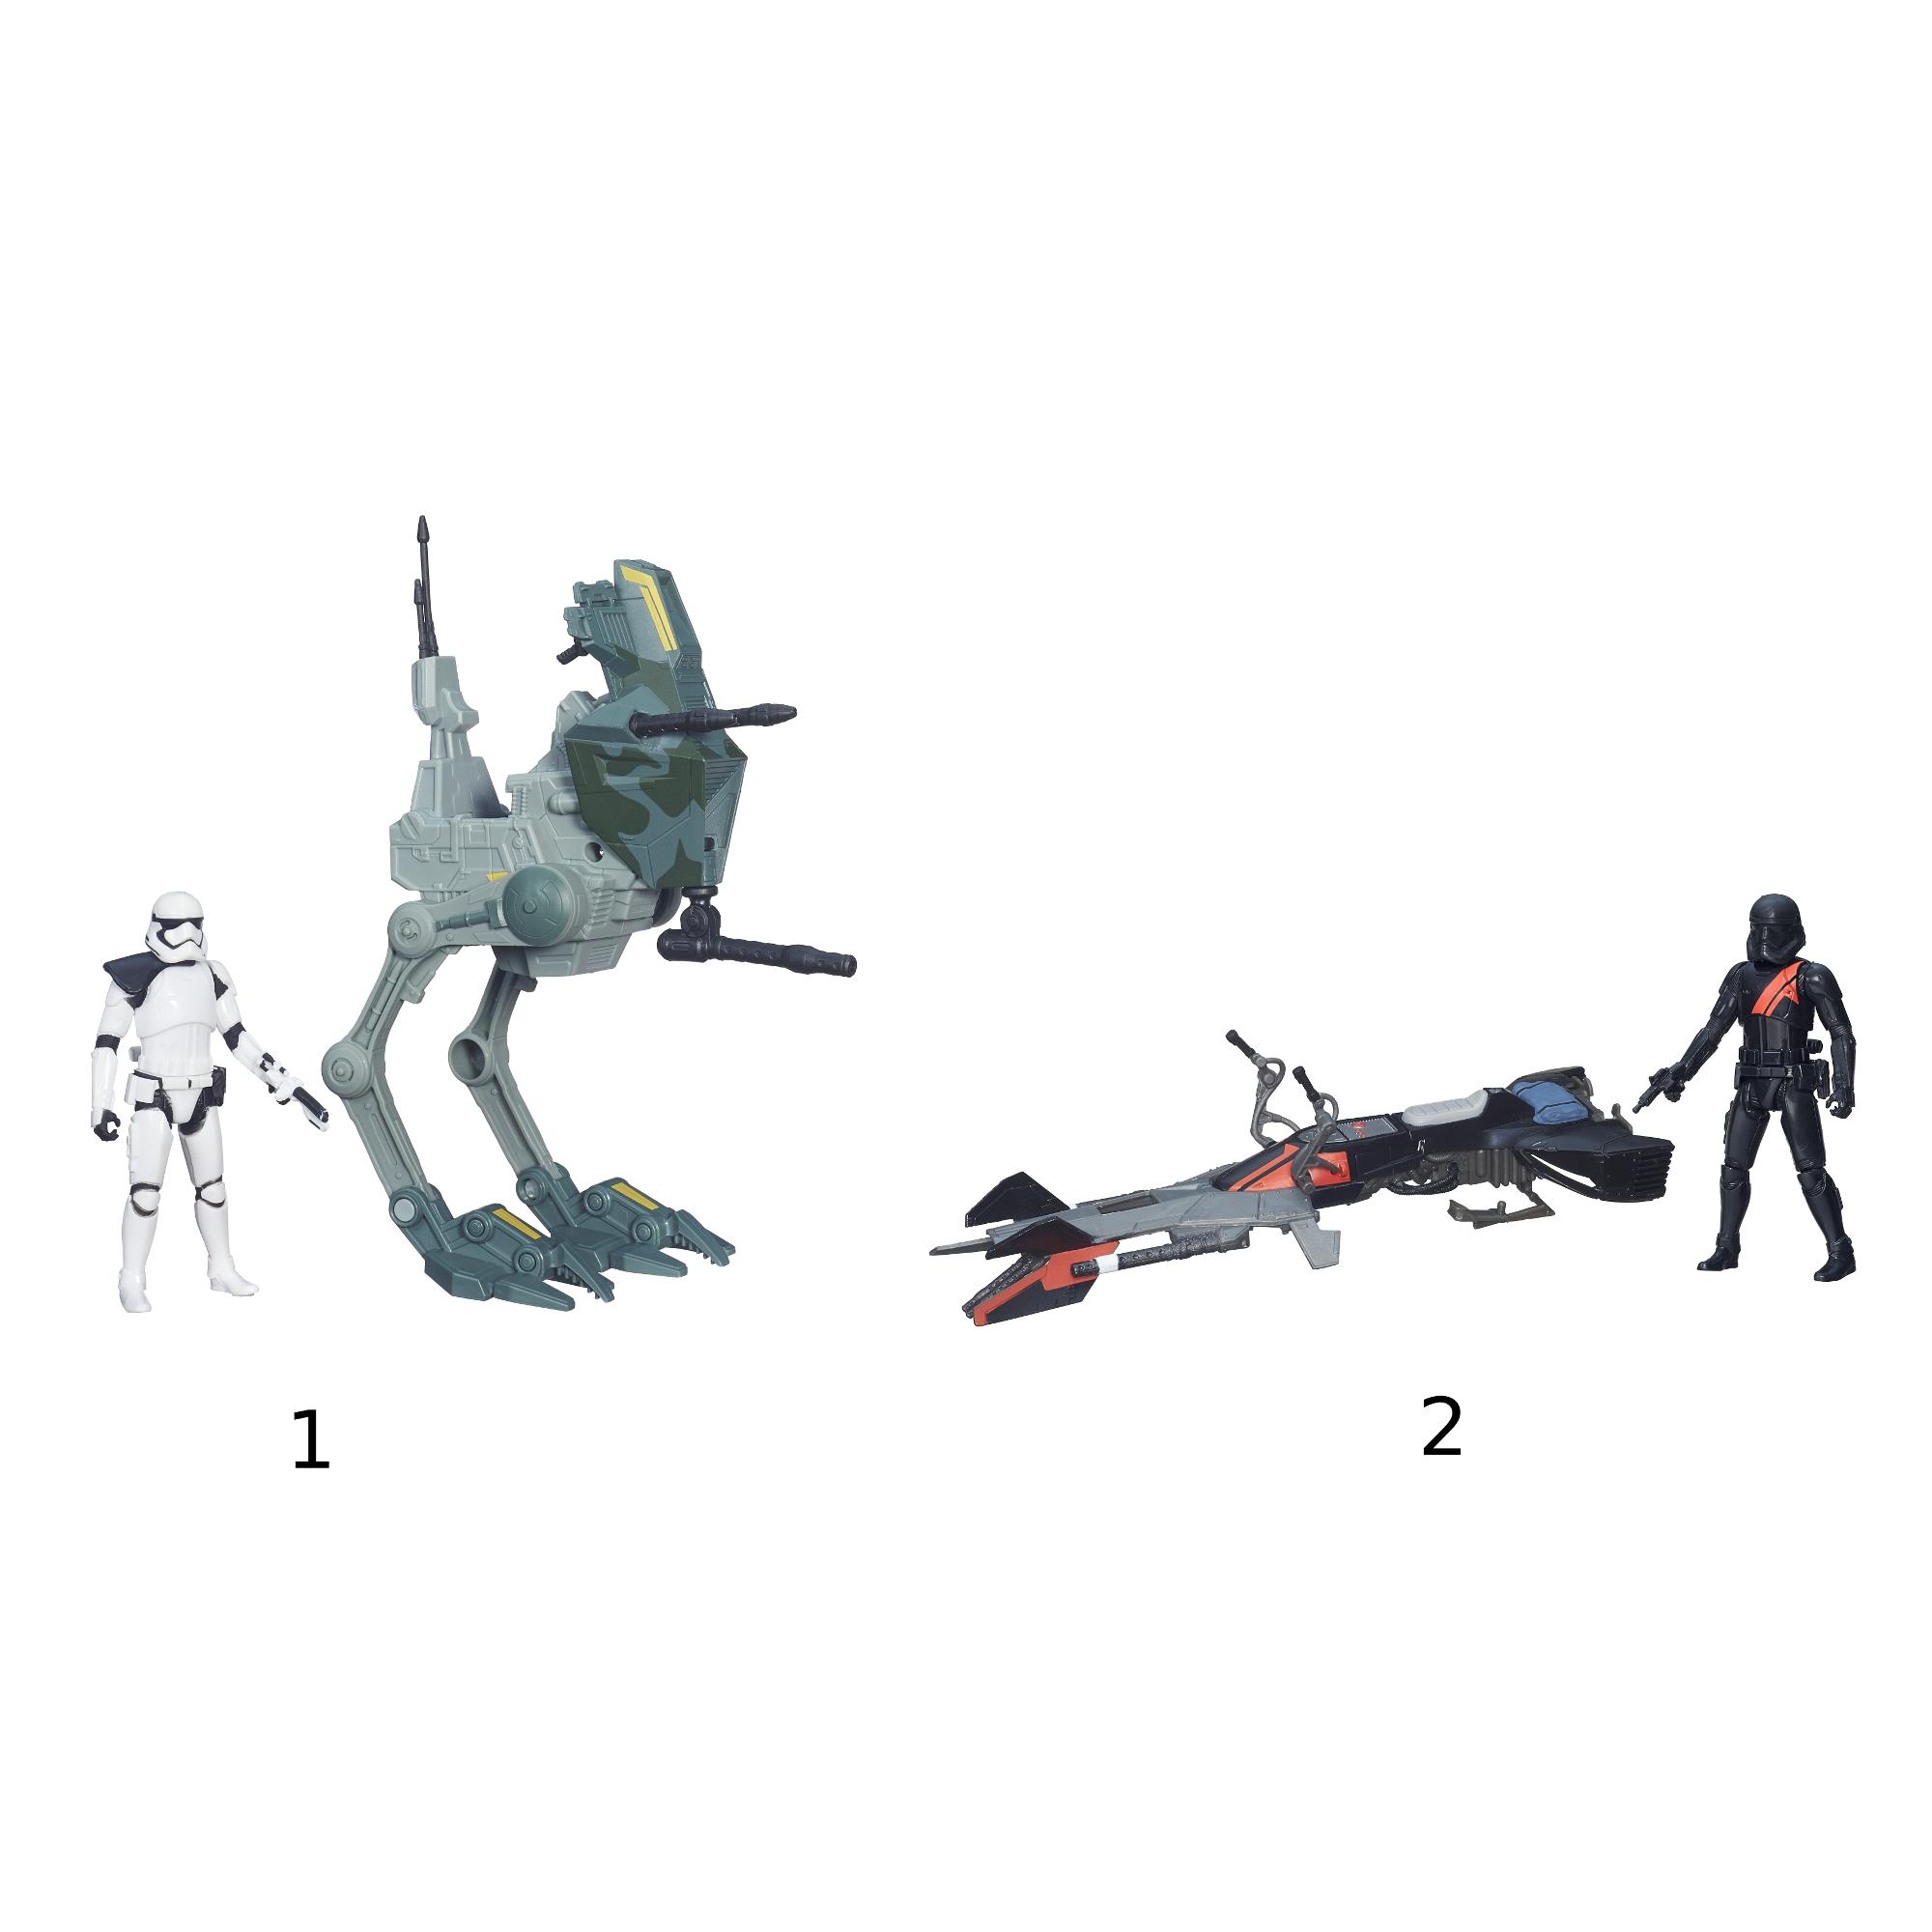 Star Wars. Космический корабль Звездных войн. Класс I - Игрушки Star Wars (Звездные воины), артикул: 135102